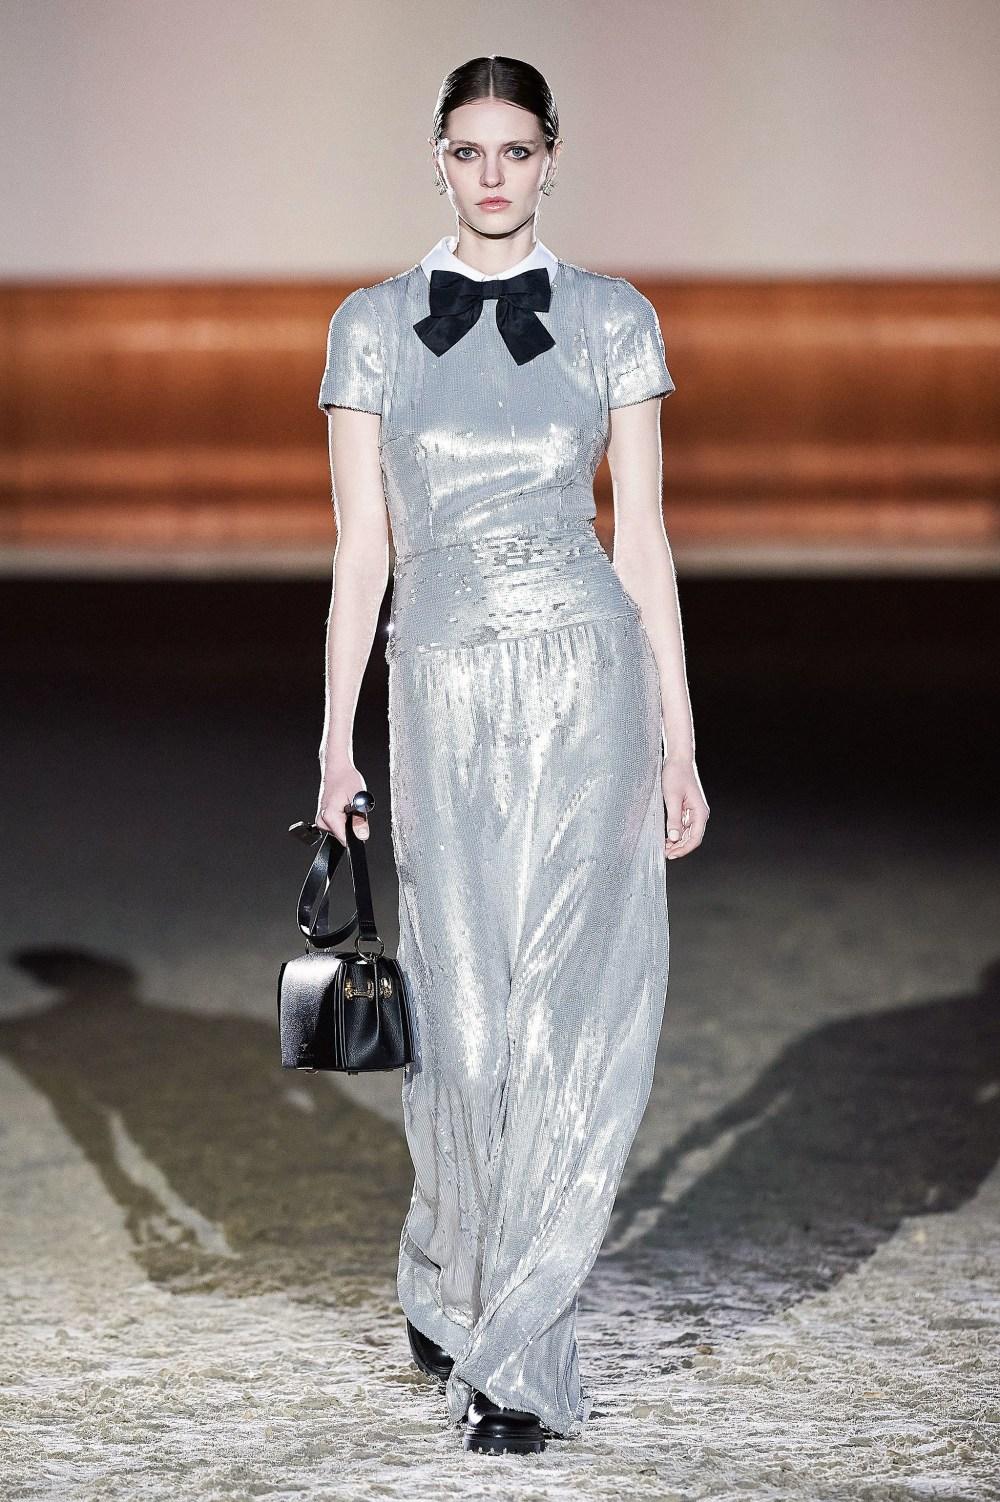 Elisabetta Franchi: Elisabetta Franchi Fall Winter 2021-22 Fashion Show Photo #30